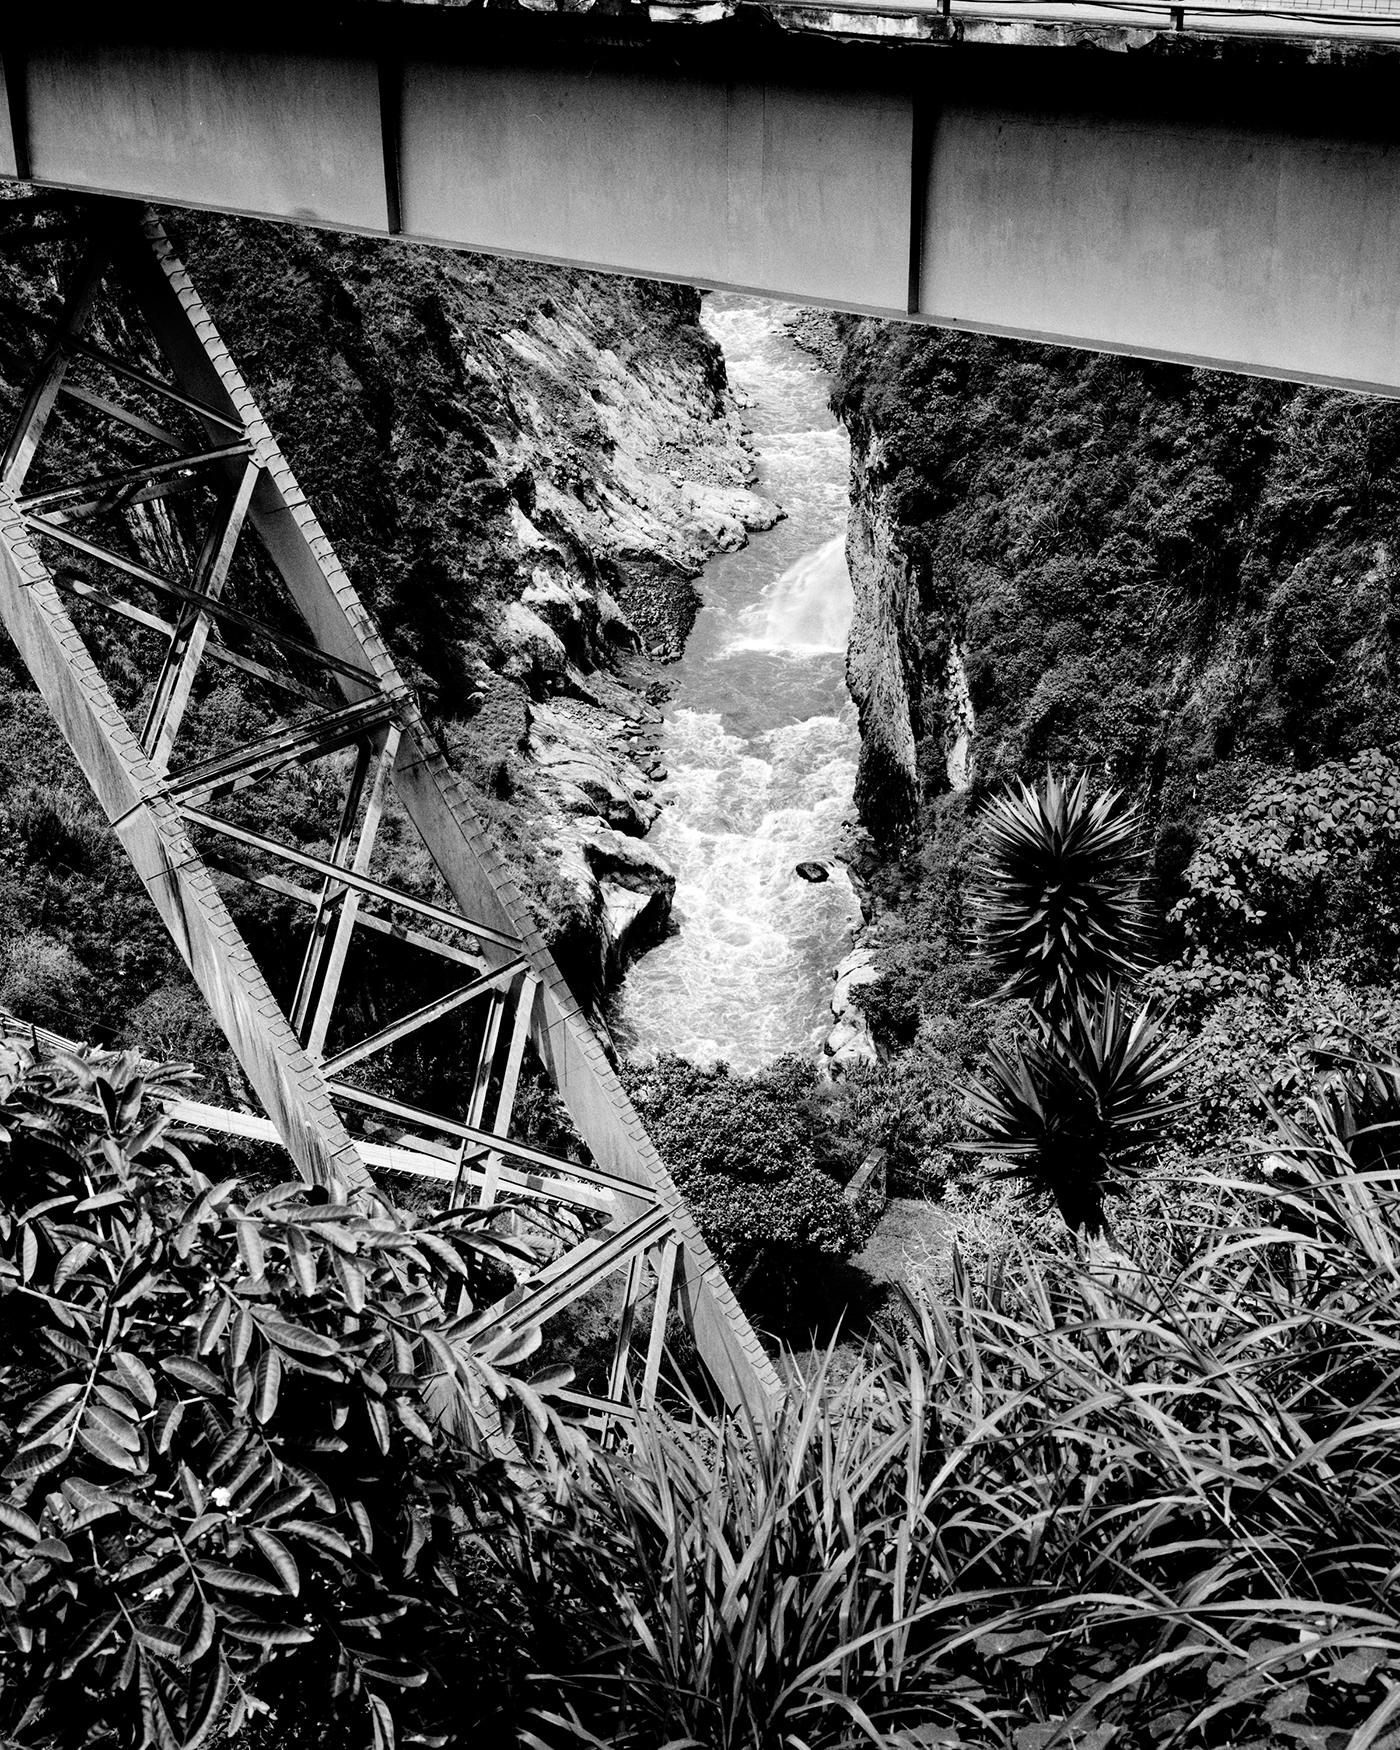 Tungurahua_006.jpg